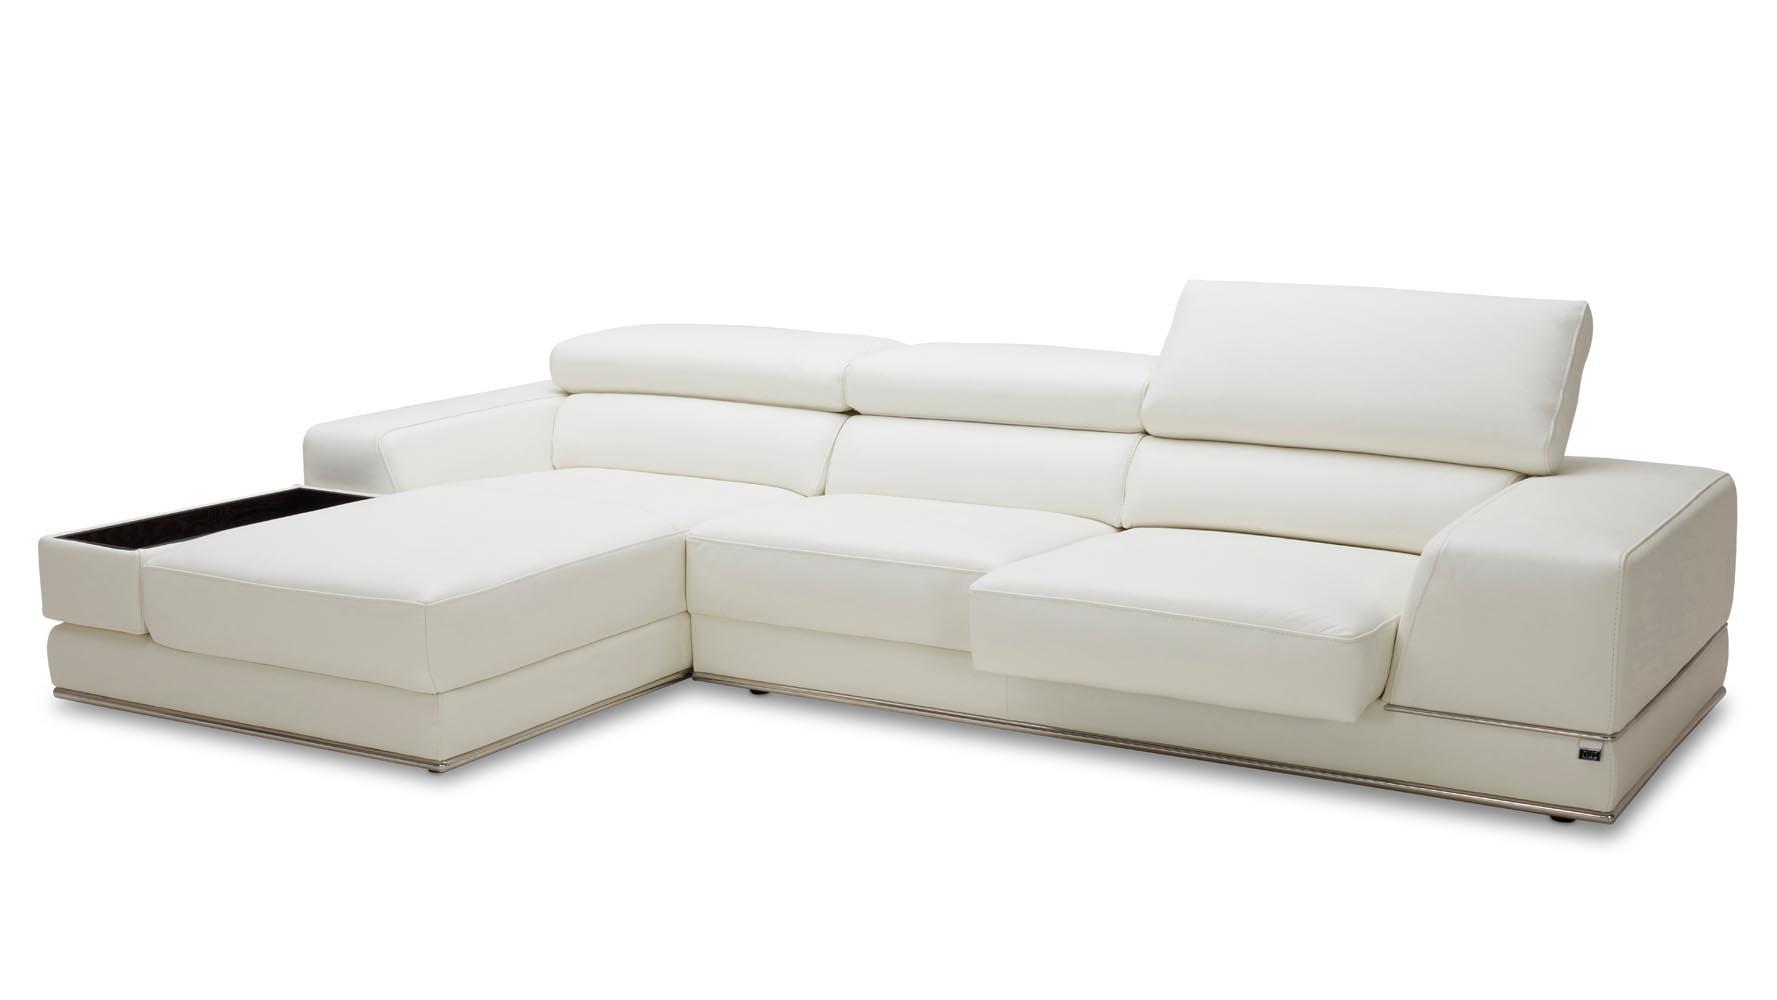 encore white leather sectional sofa zuri furniture. Black Bedroom Furniture Sets. Home Design Ideas